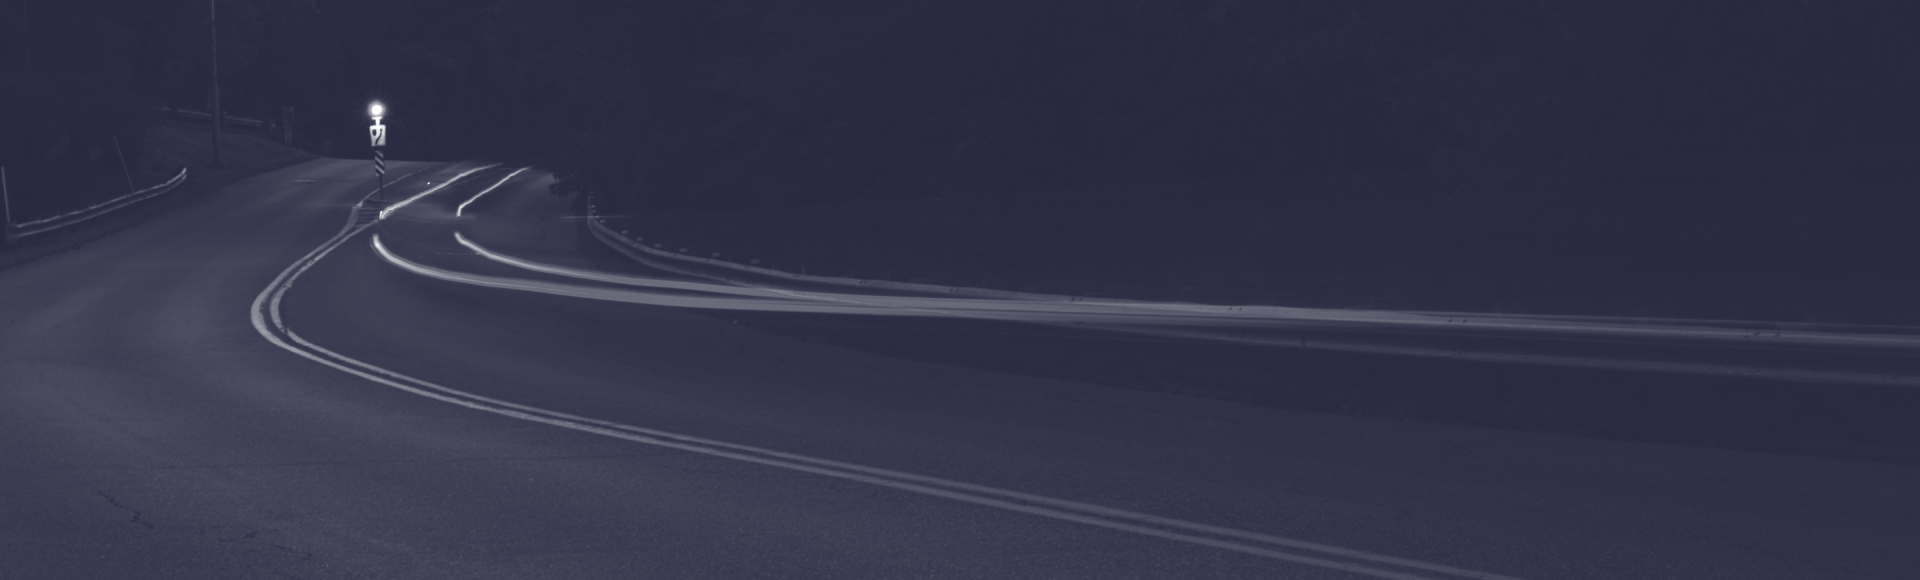 ARK-Invest_Blog-Banner_2016_08_26---Automotive-Industry